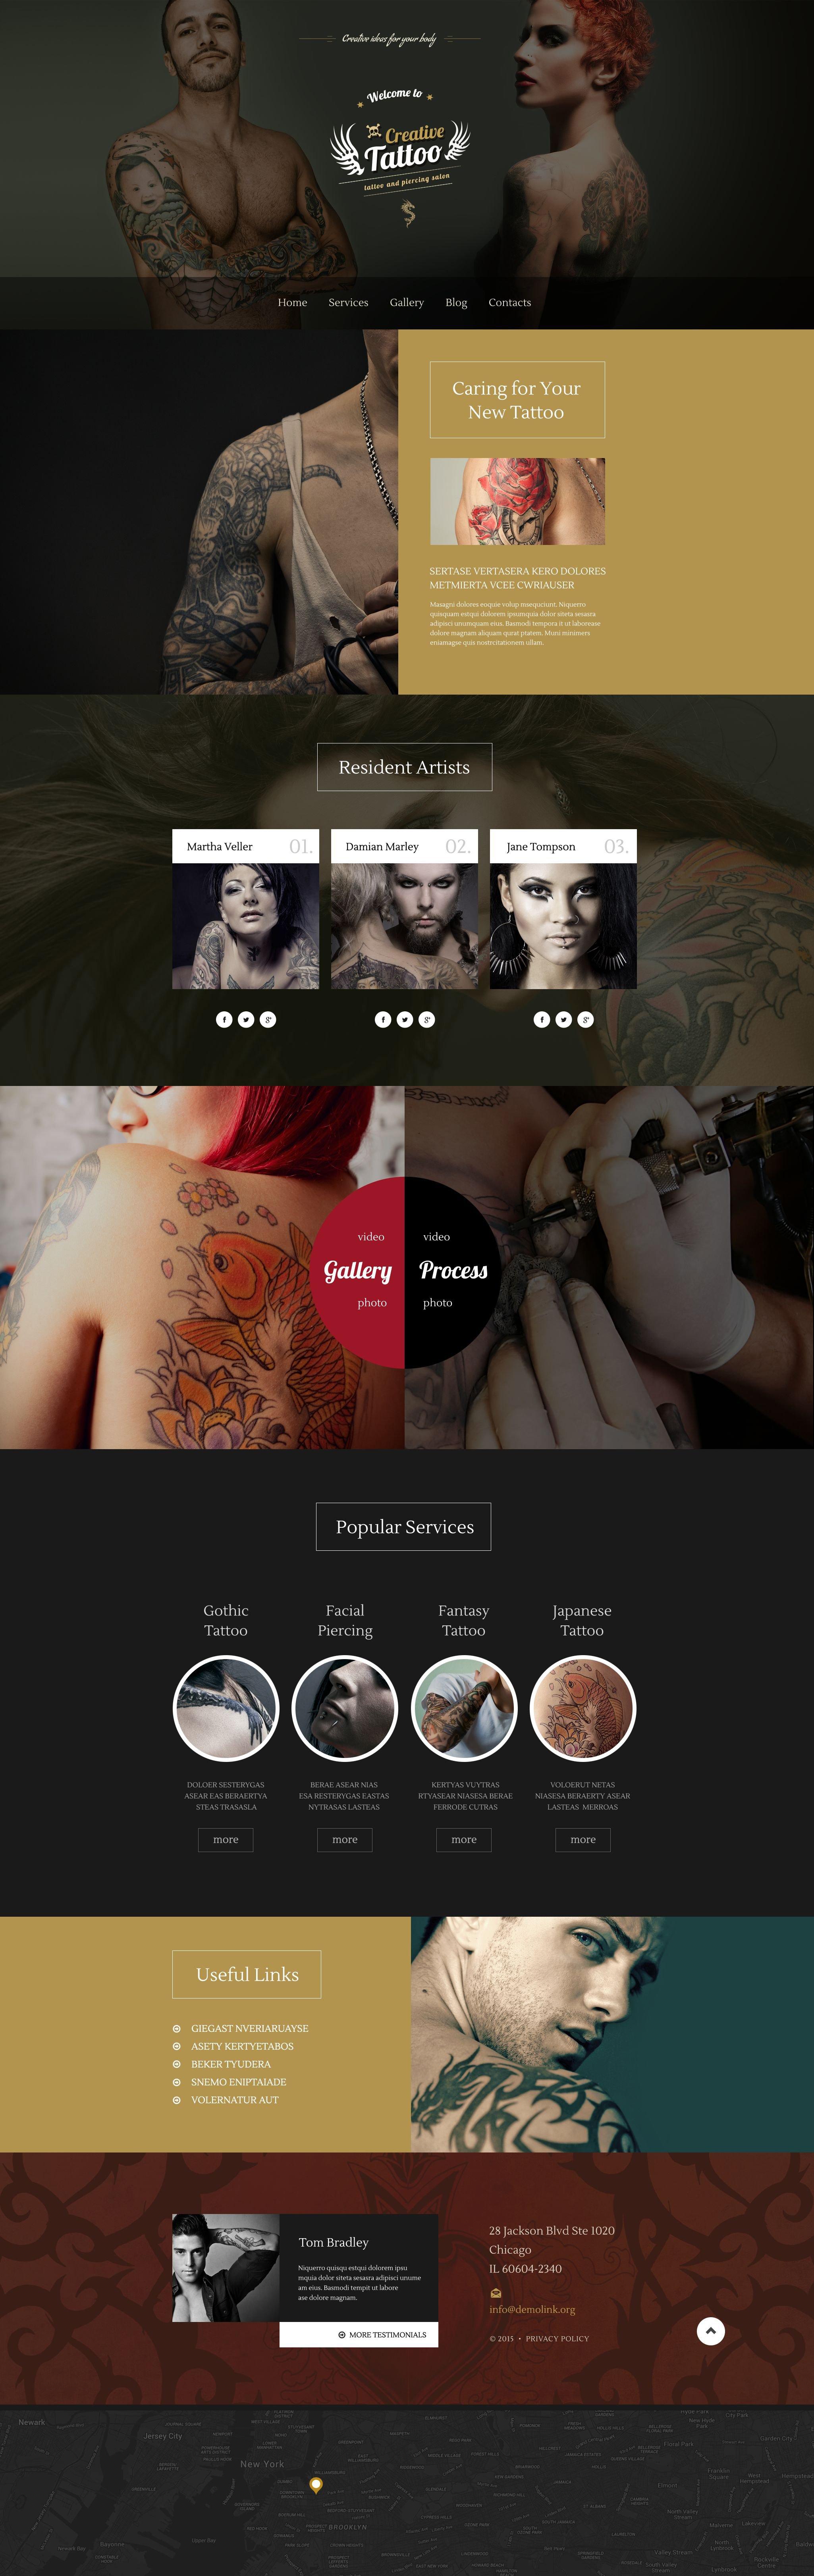 Responsivt Creative Tattoo WordPress-tema #55046 - skärmbild